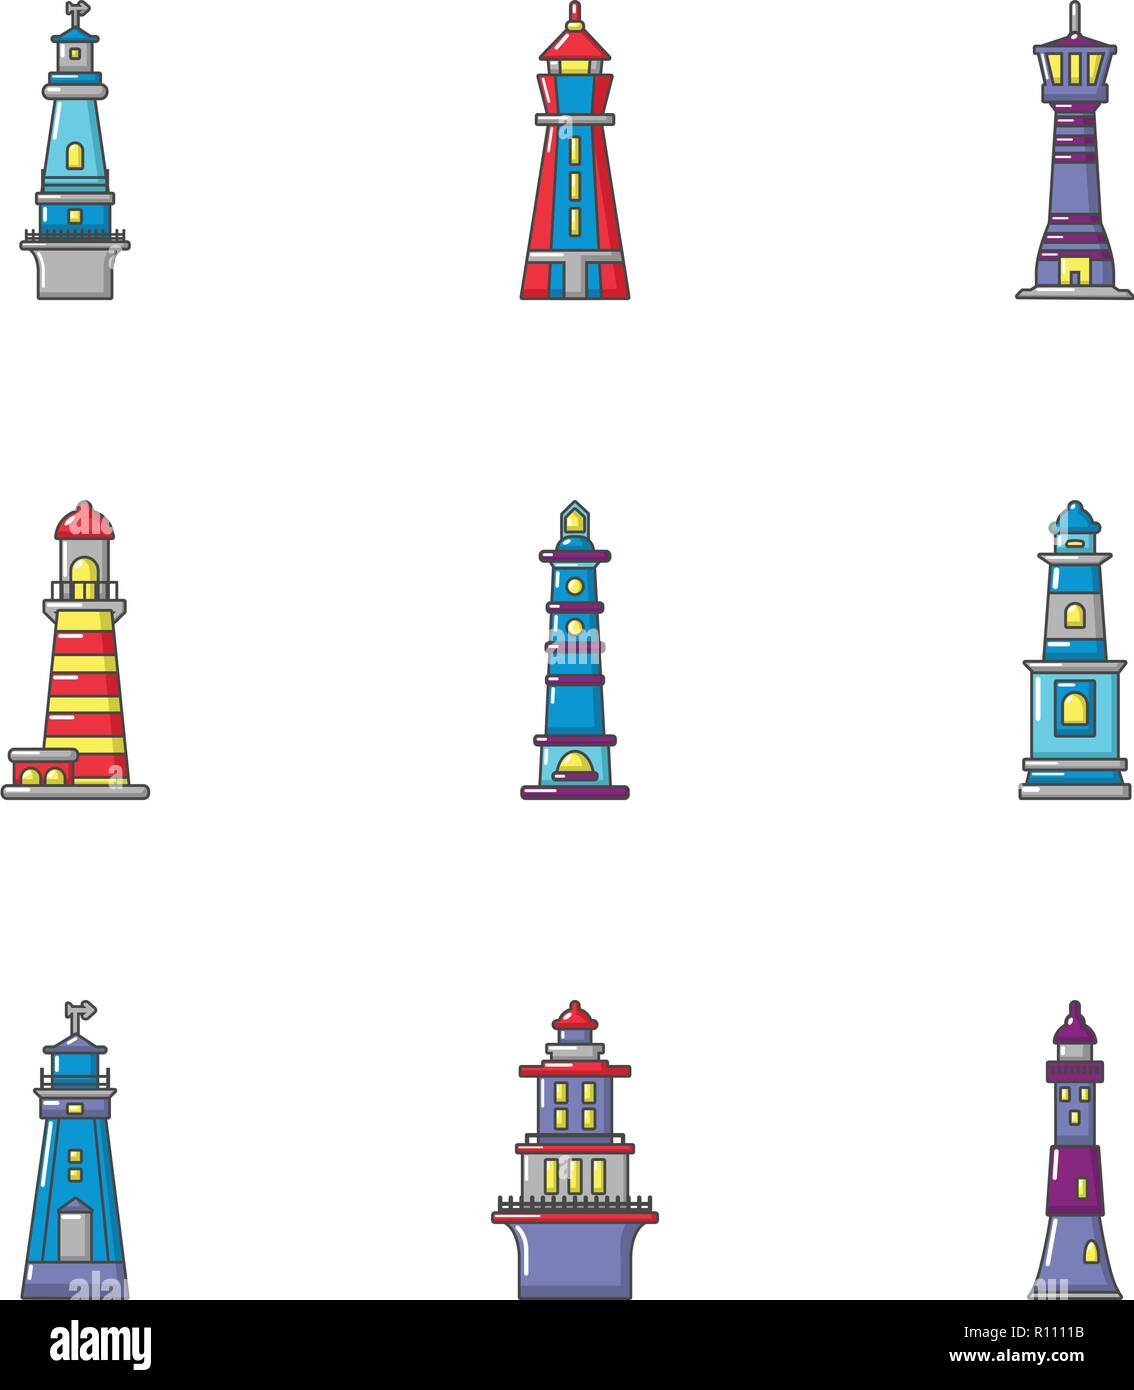 Guiding light icons set, flat style - Stock Image